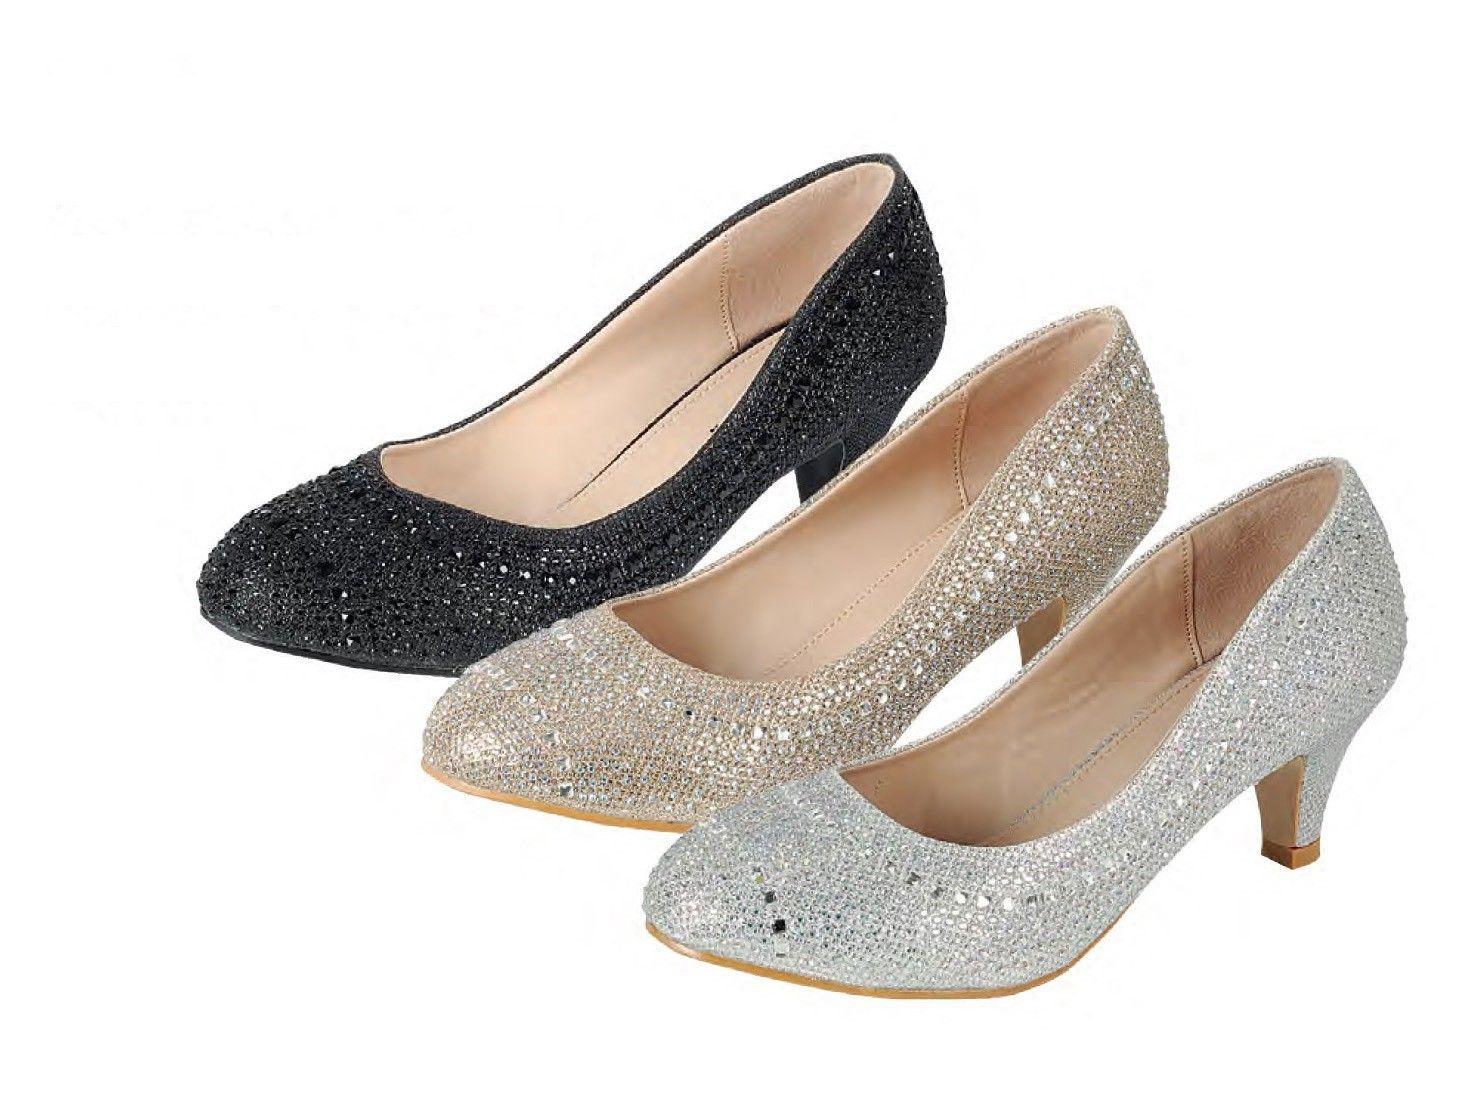 Low heel dress shoes for wedding  Glitter Rhinestone Crystal Dress Wedding Prom Pump Shoes Med Low